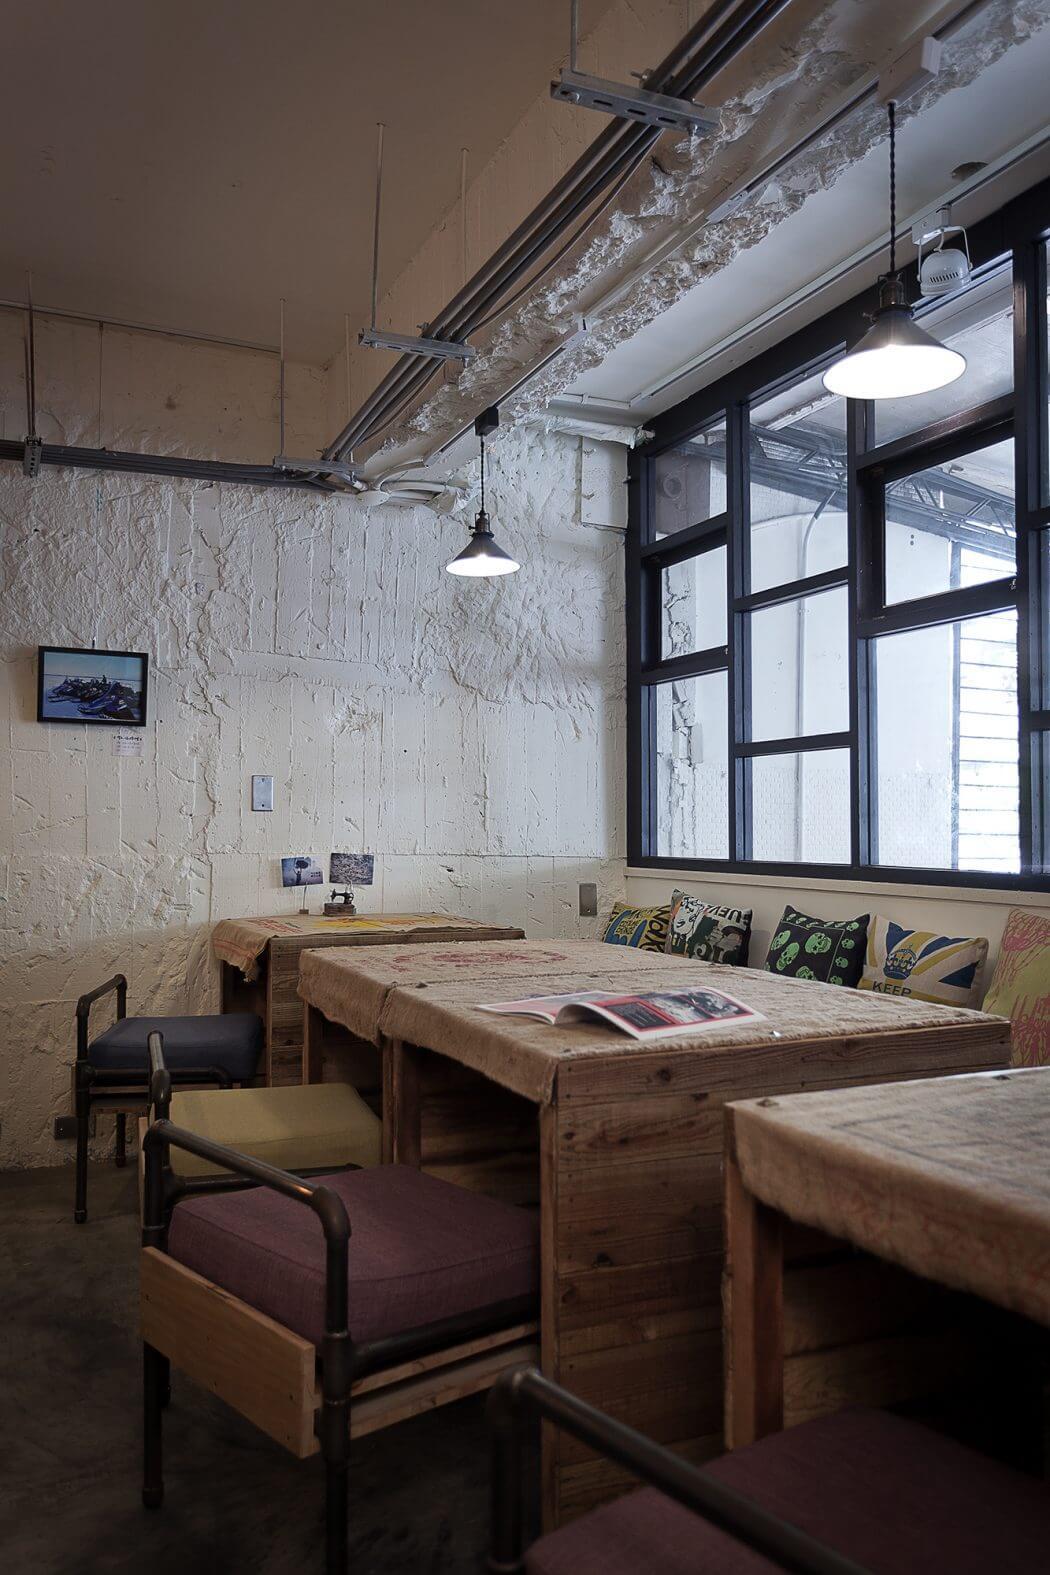 004-laundry-coffee-shop-formo-design-studio-1050x1575